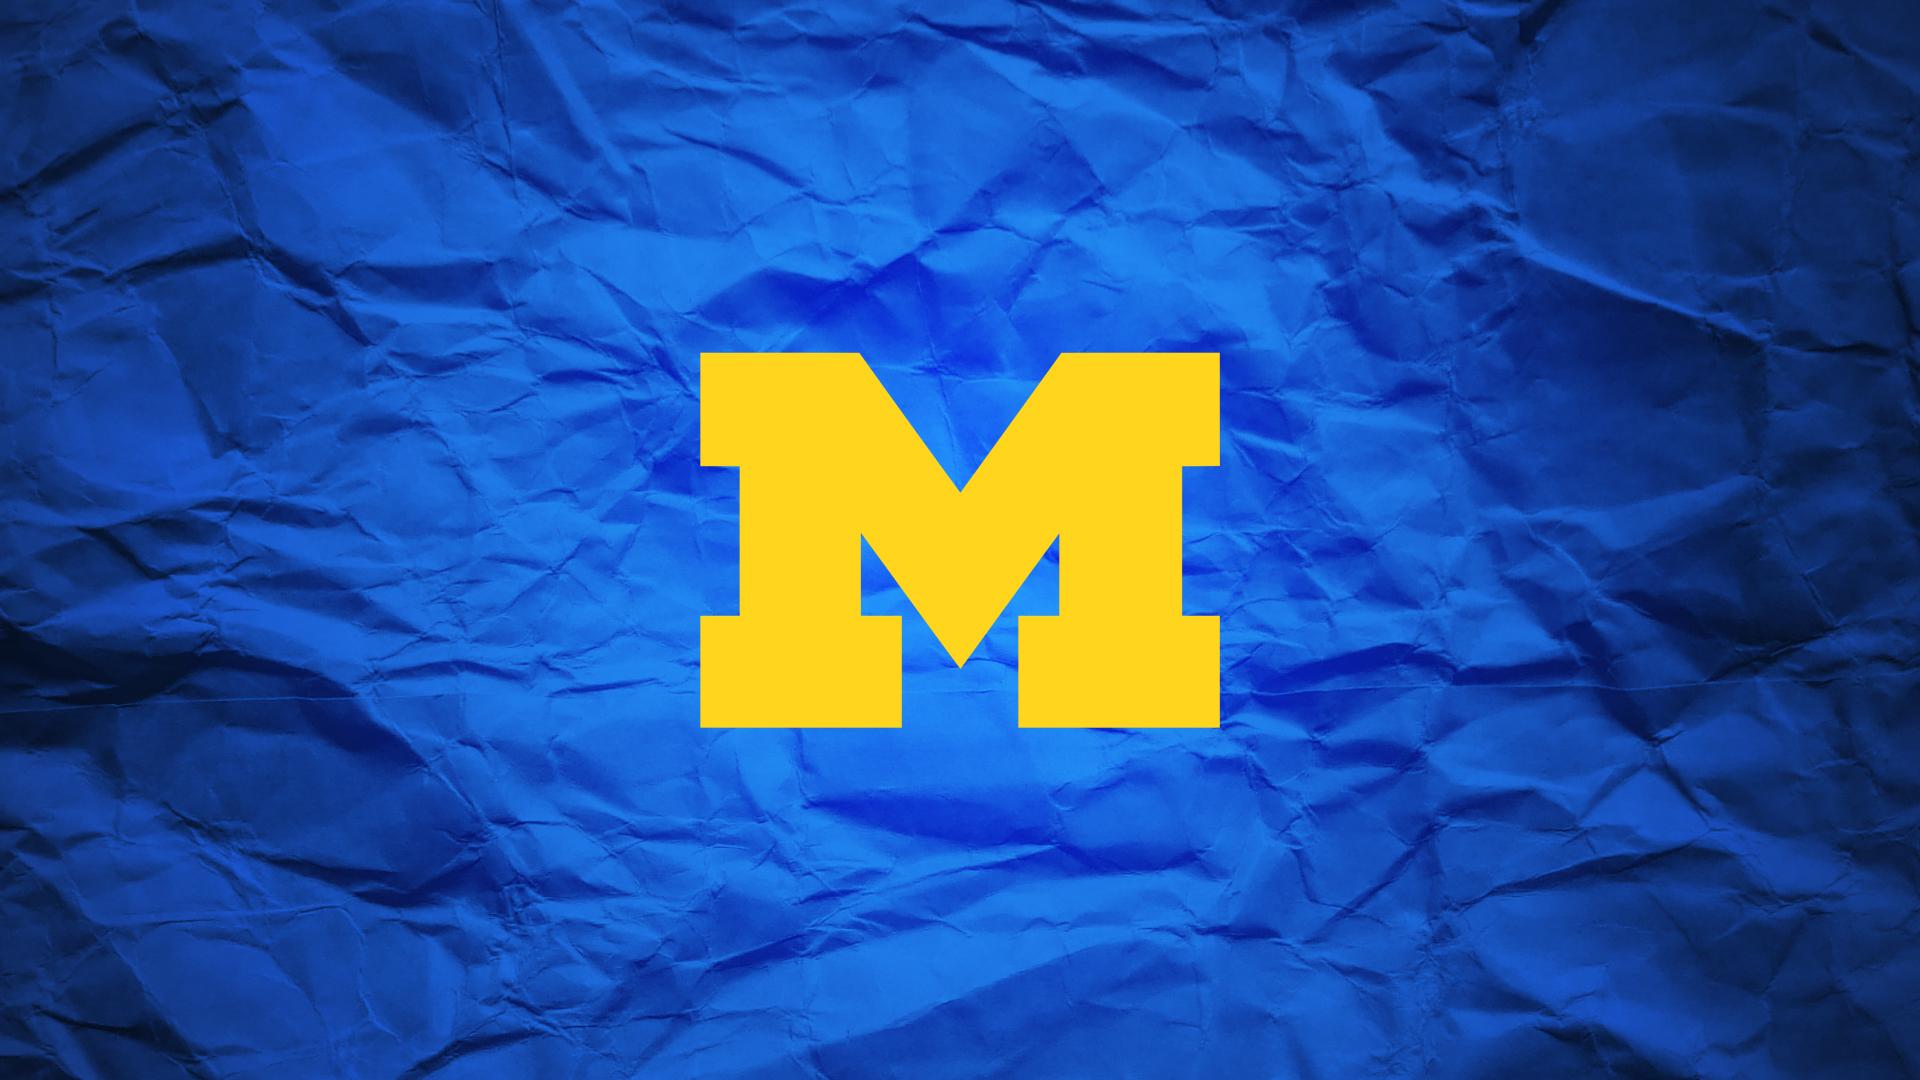 Michigan University Wallpaper 1920x1080 Michigan University Of 1920x1080